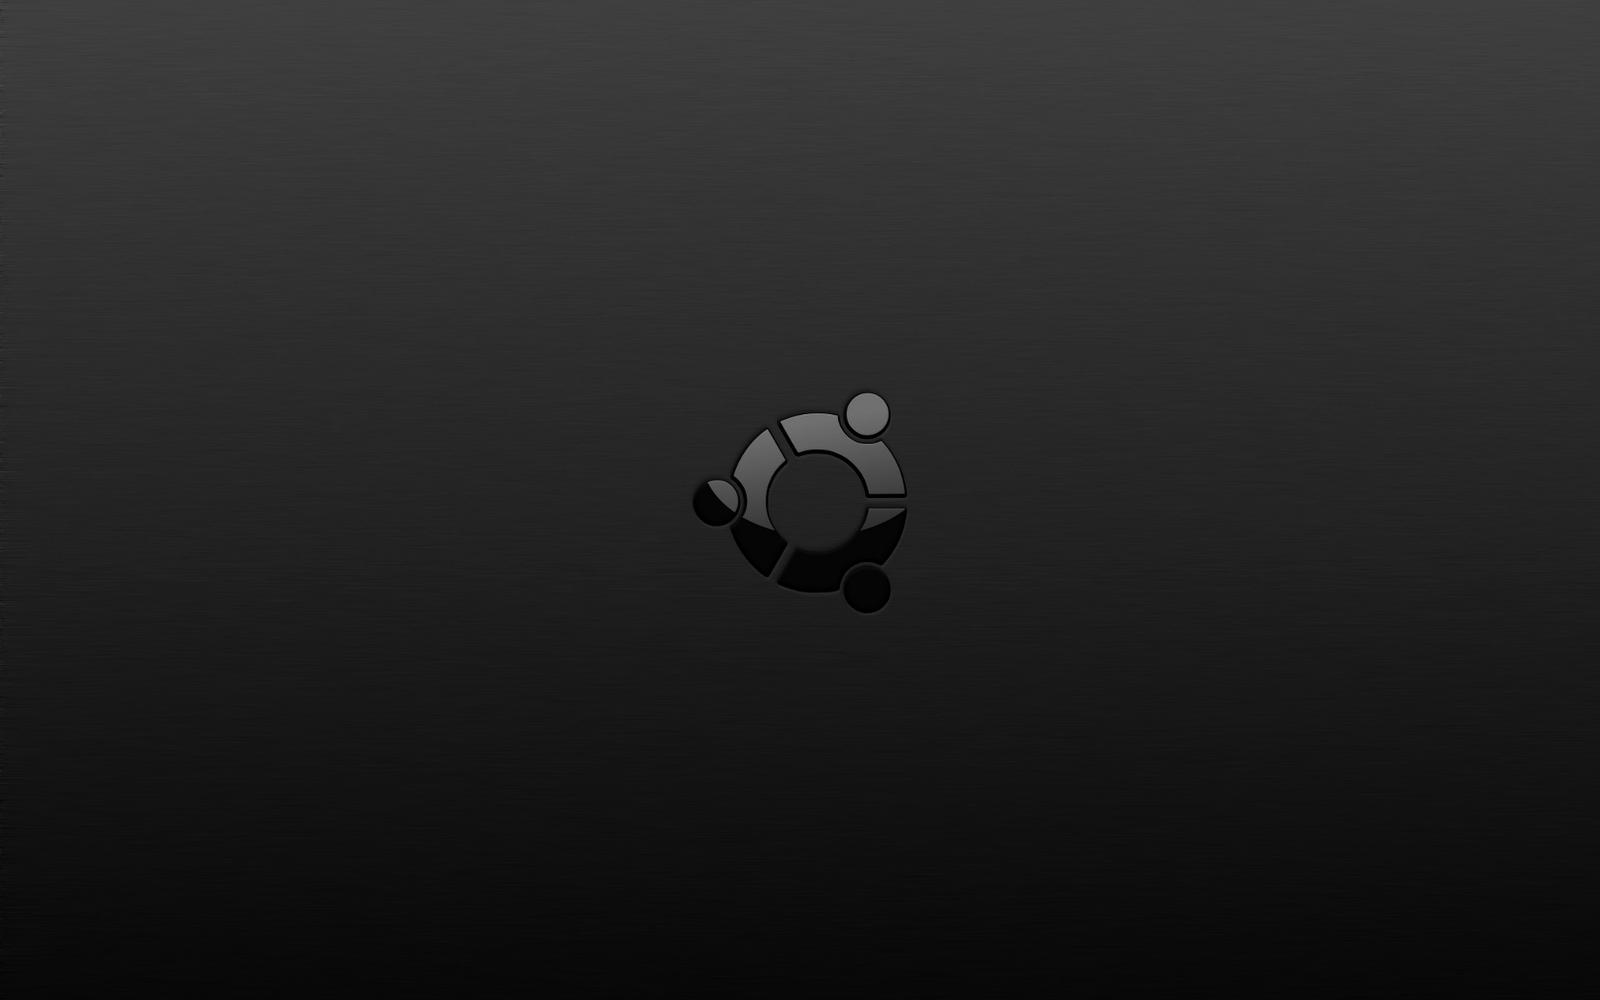 Ubuntu HD Desktop Wallpaper Desktop Wallpapers 1600x1000